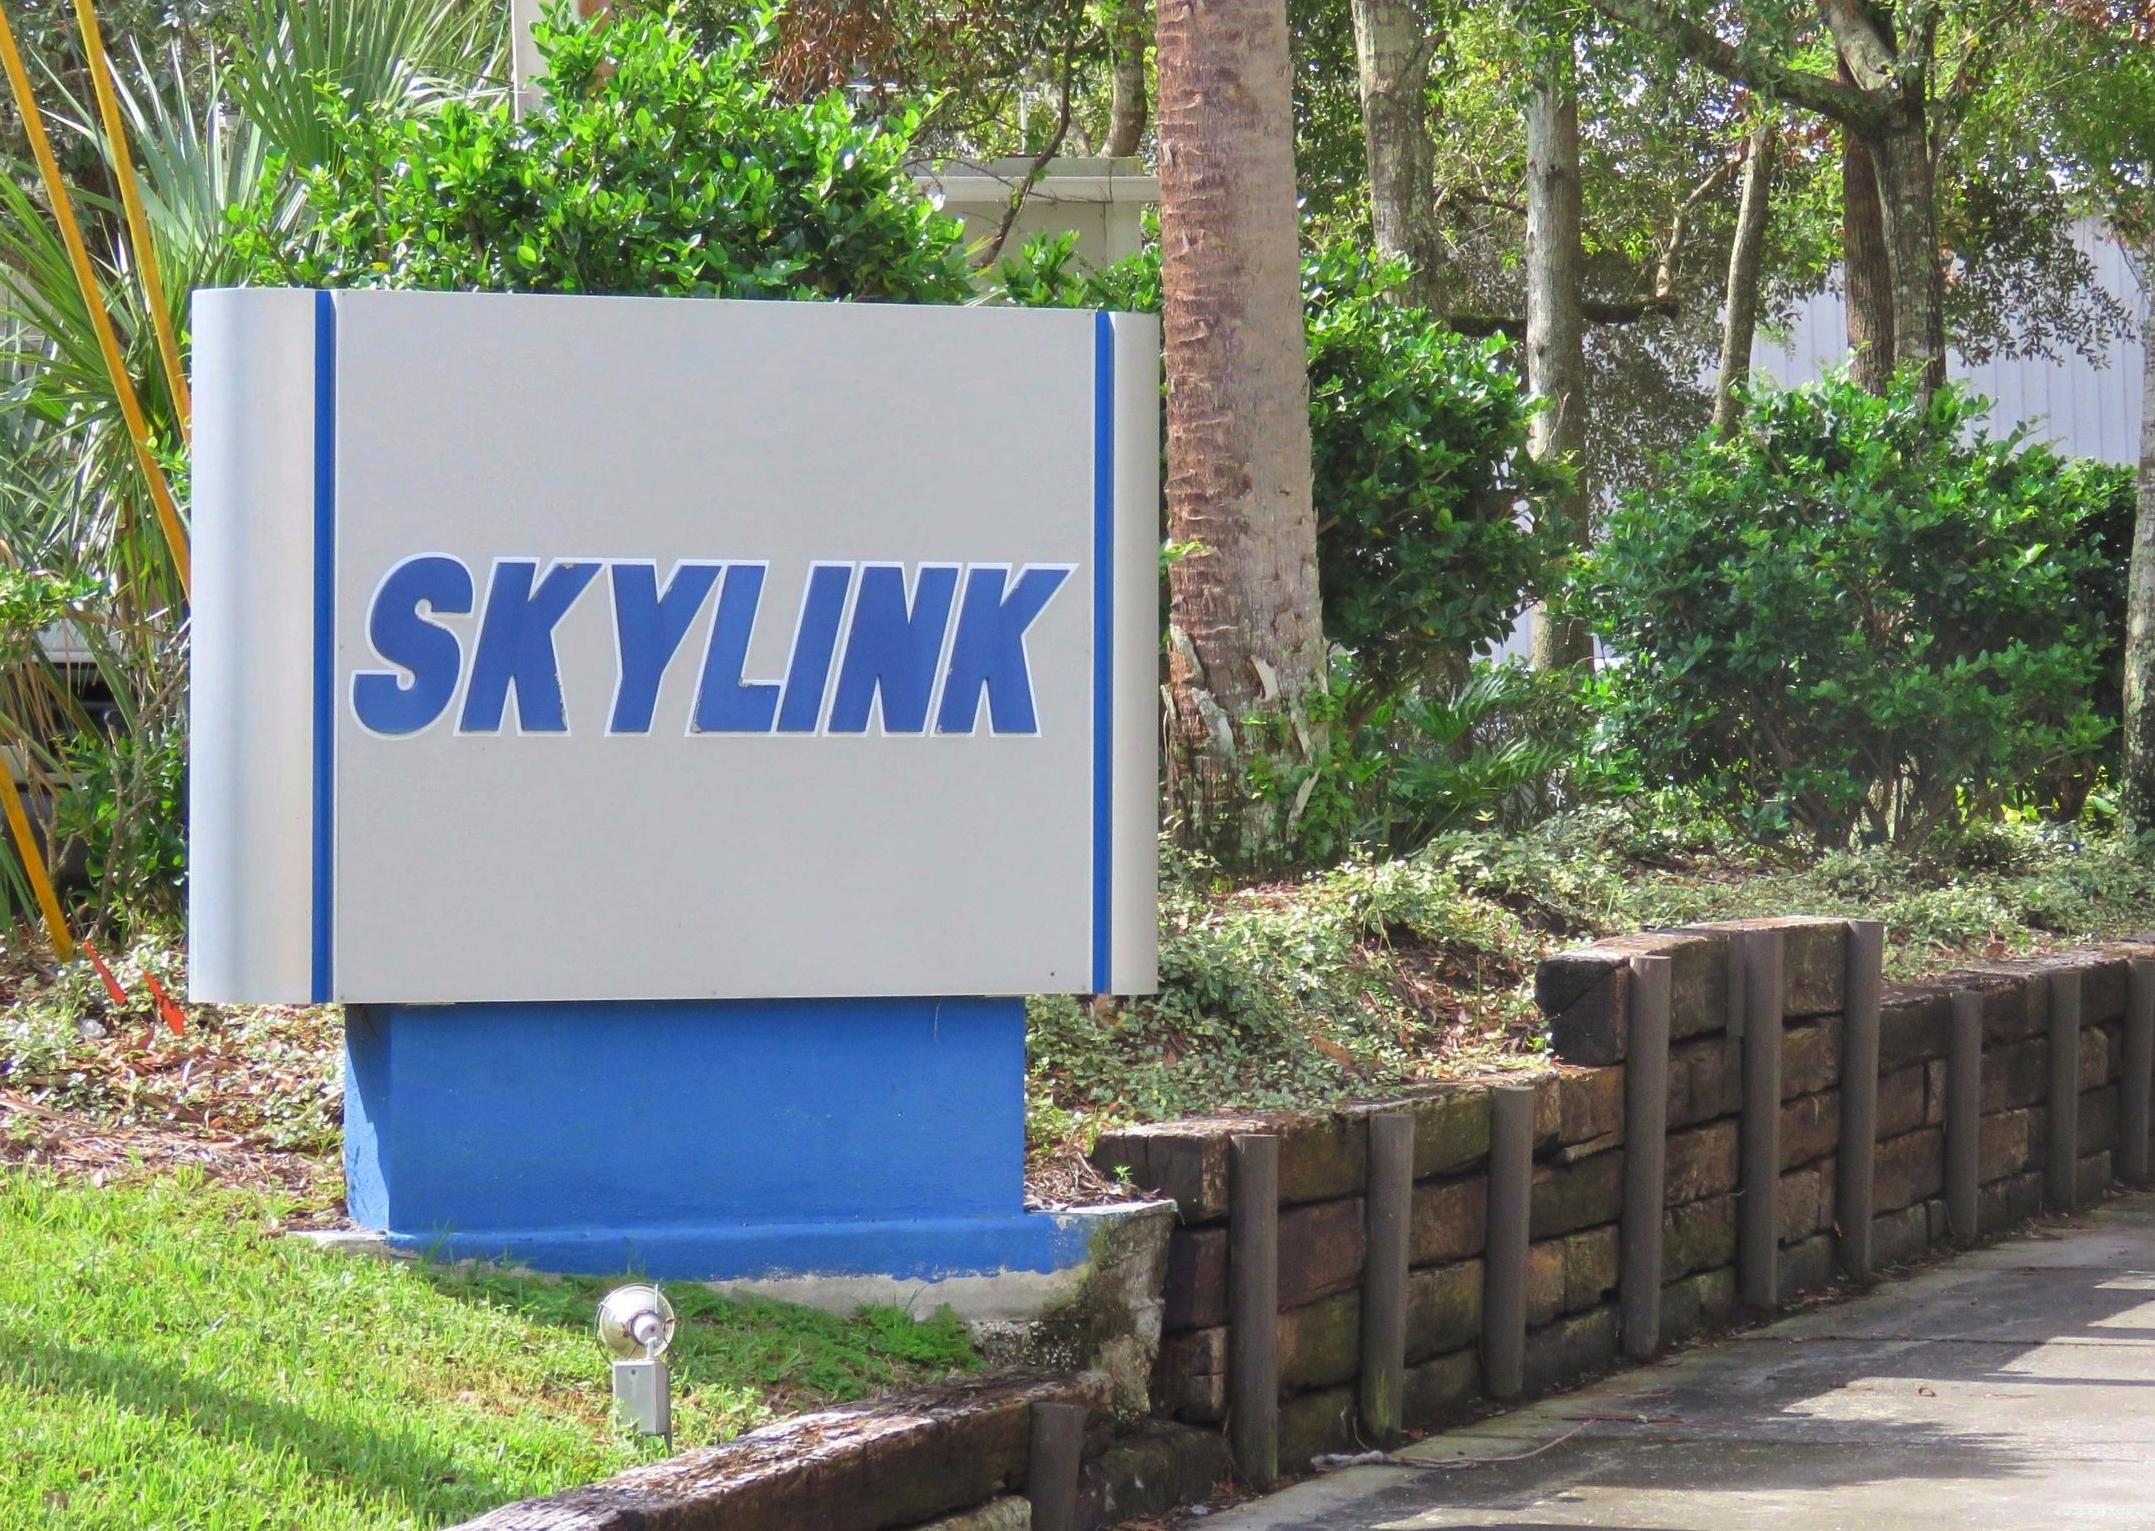 Skylink enterance.jpg